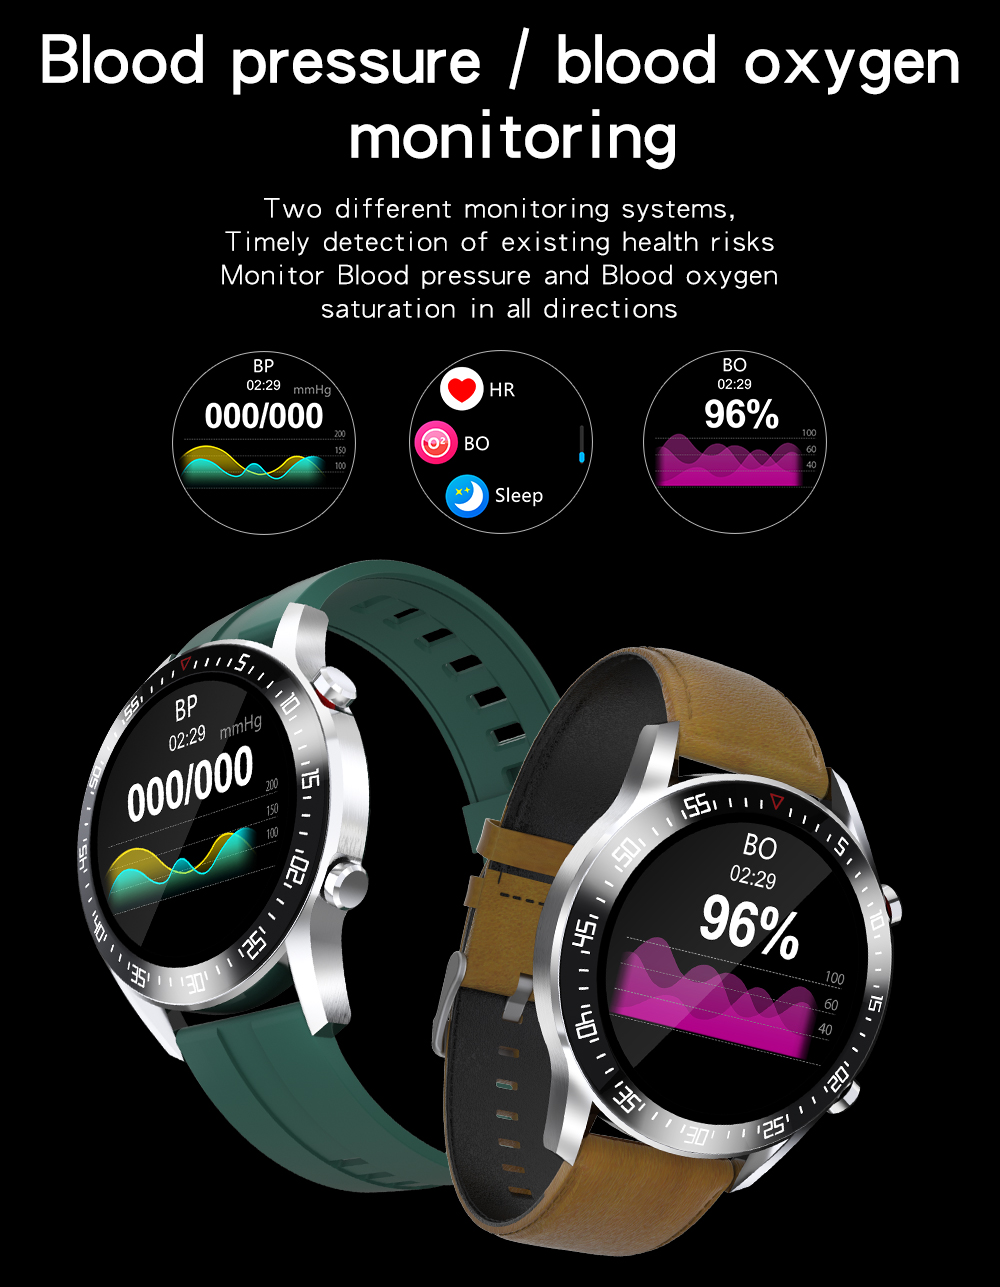 H44bff1b368144325b3f25cc88dcd6d28j XUESEVEN 2021 HD Full circle touch screen Mens Smart Watches IP68 Waterproof Sports Fitness Watch Fashion Smart Watch for men